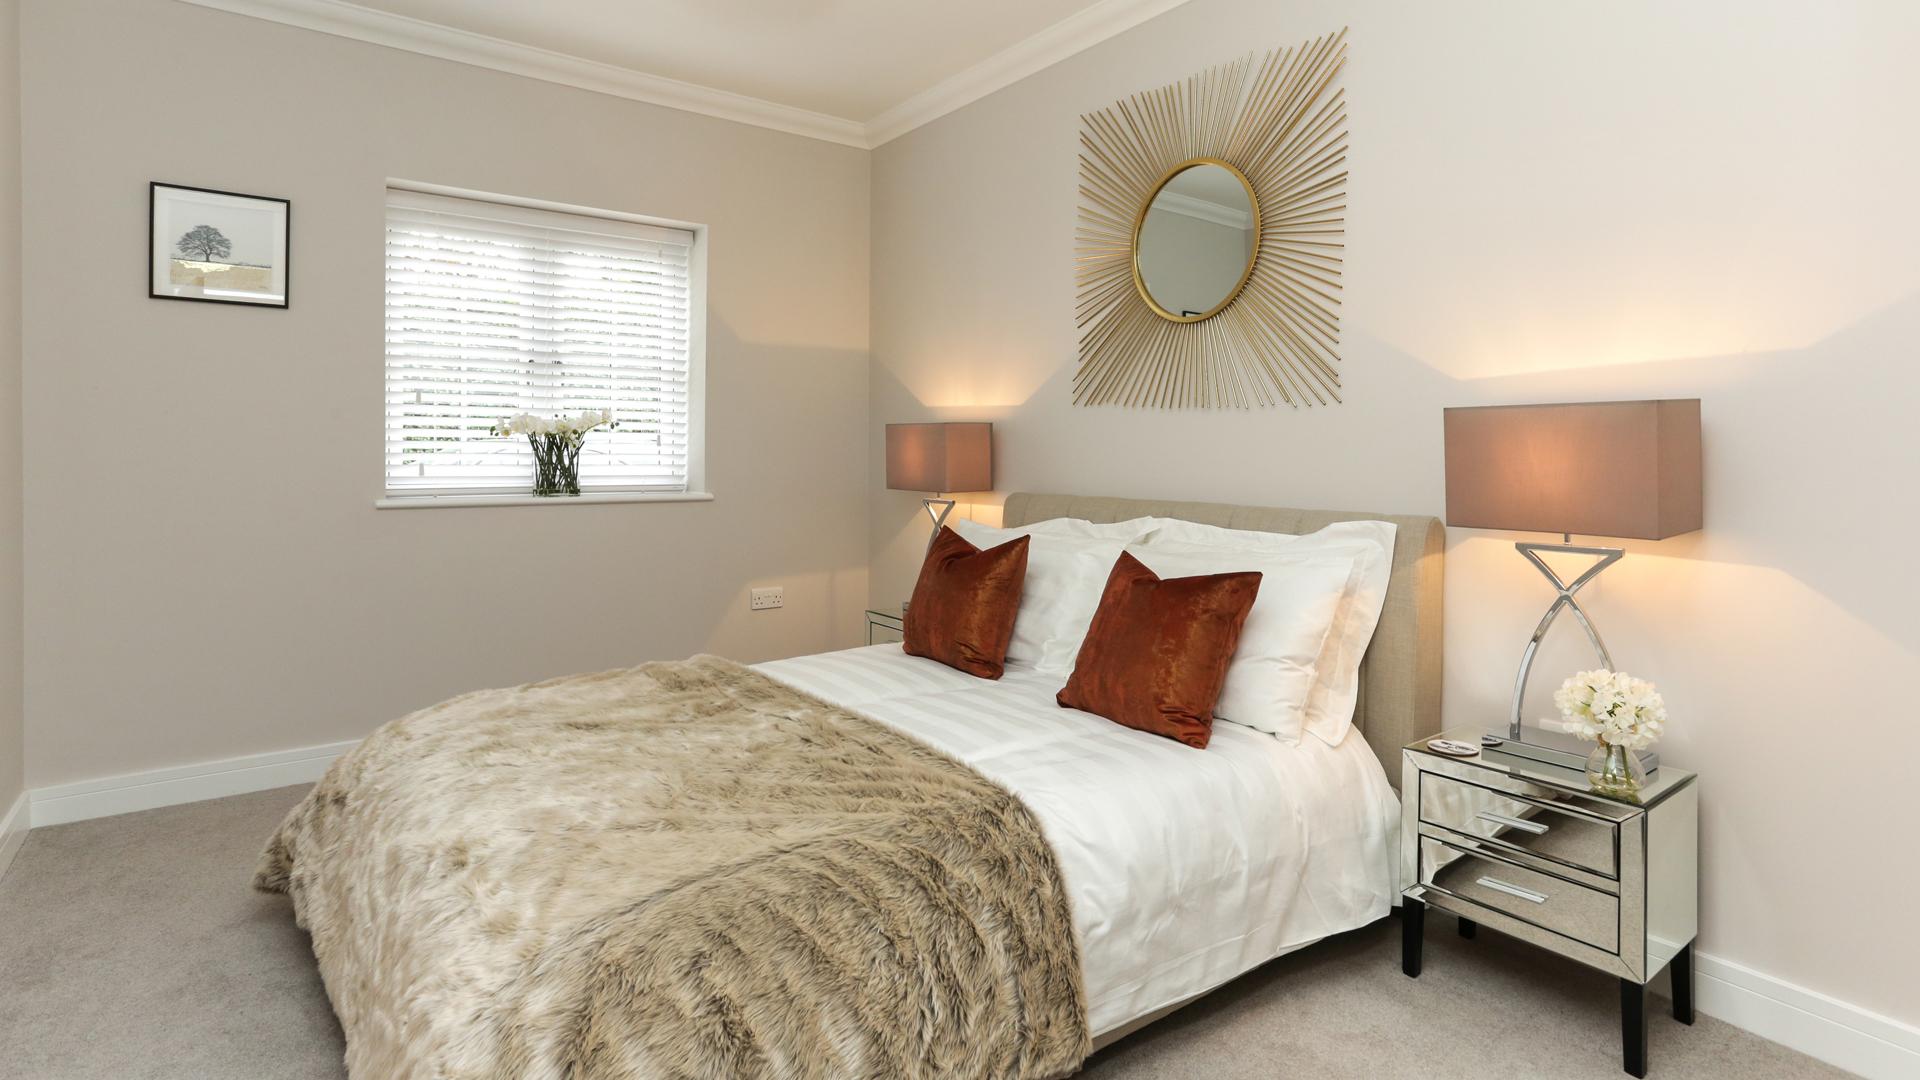 Cobnut Park plot 7 bedroom with fur blanket and neutral walls.